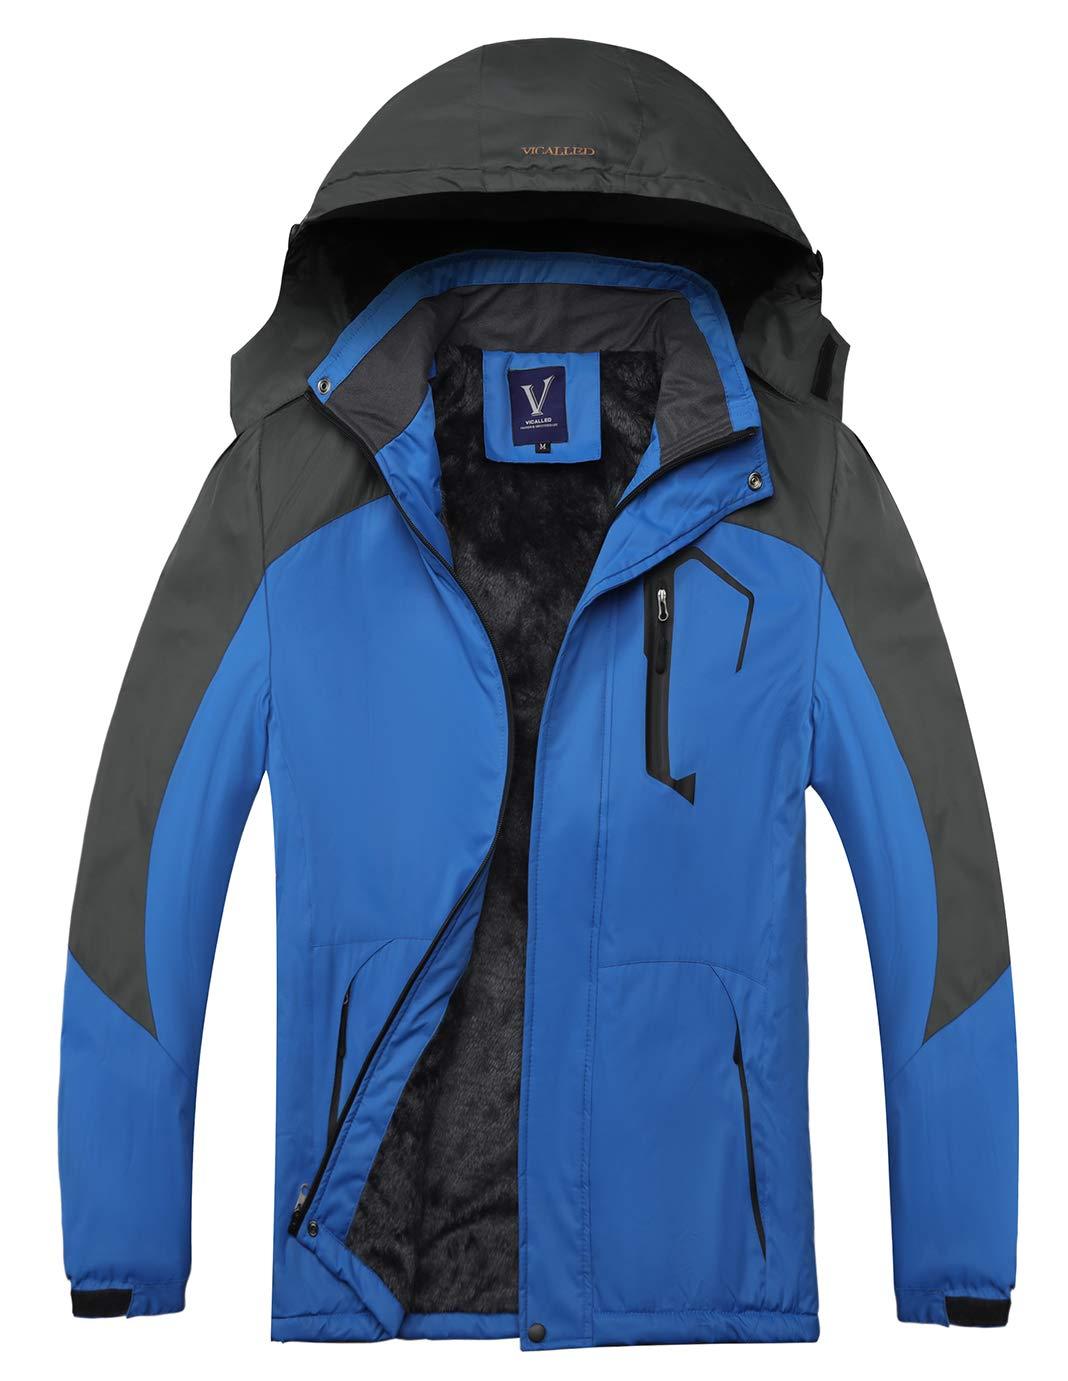 VANDIMI Mens Mountain Snow Waterproof Ski Jacket Windproof Fleece Parka Rain Jacket Winter Coat